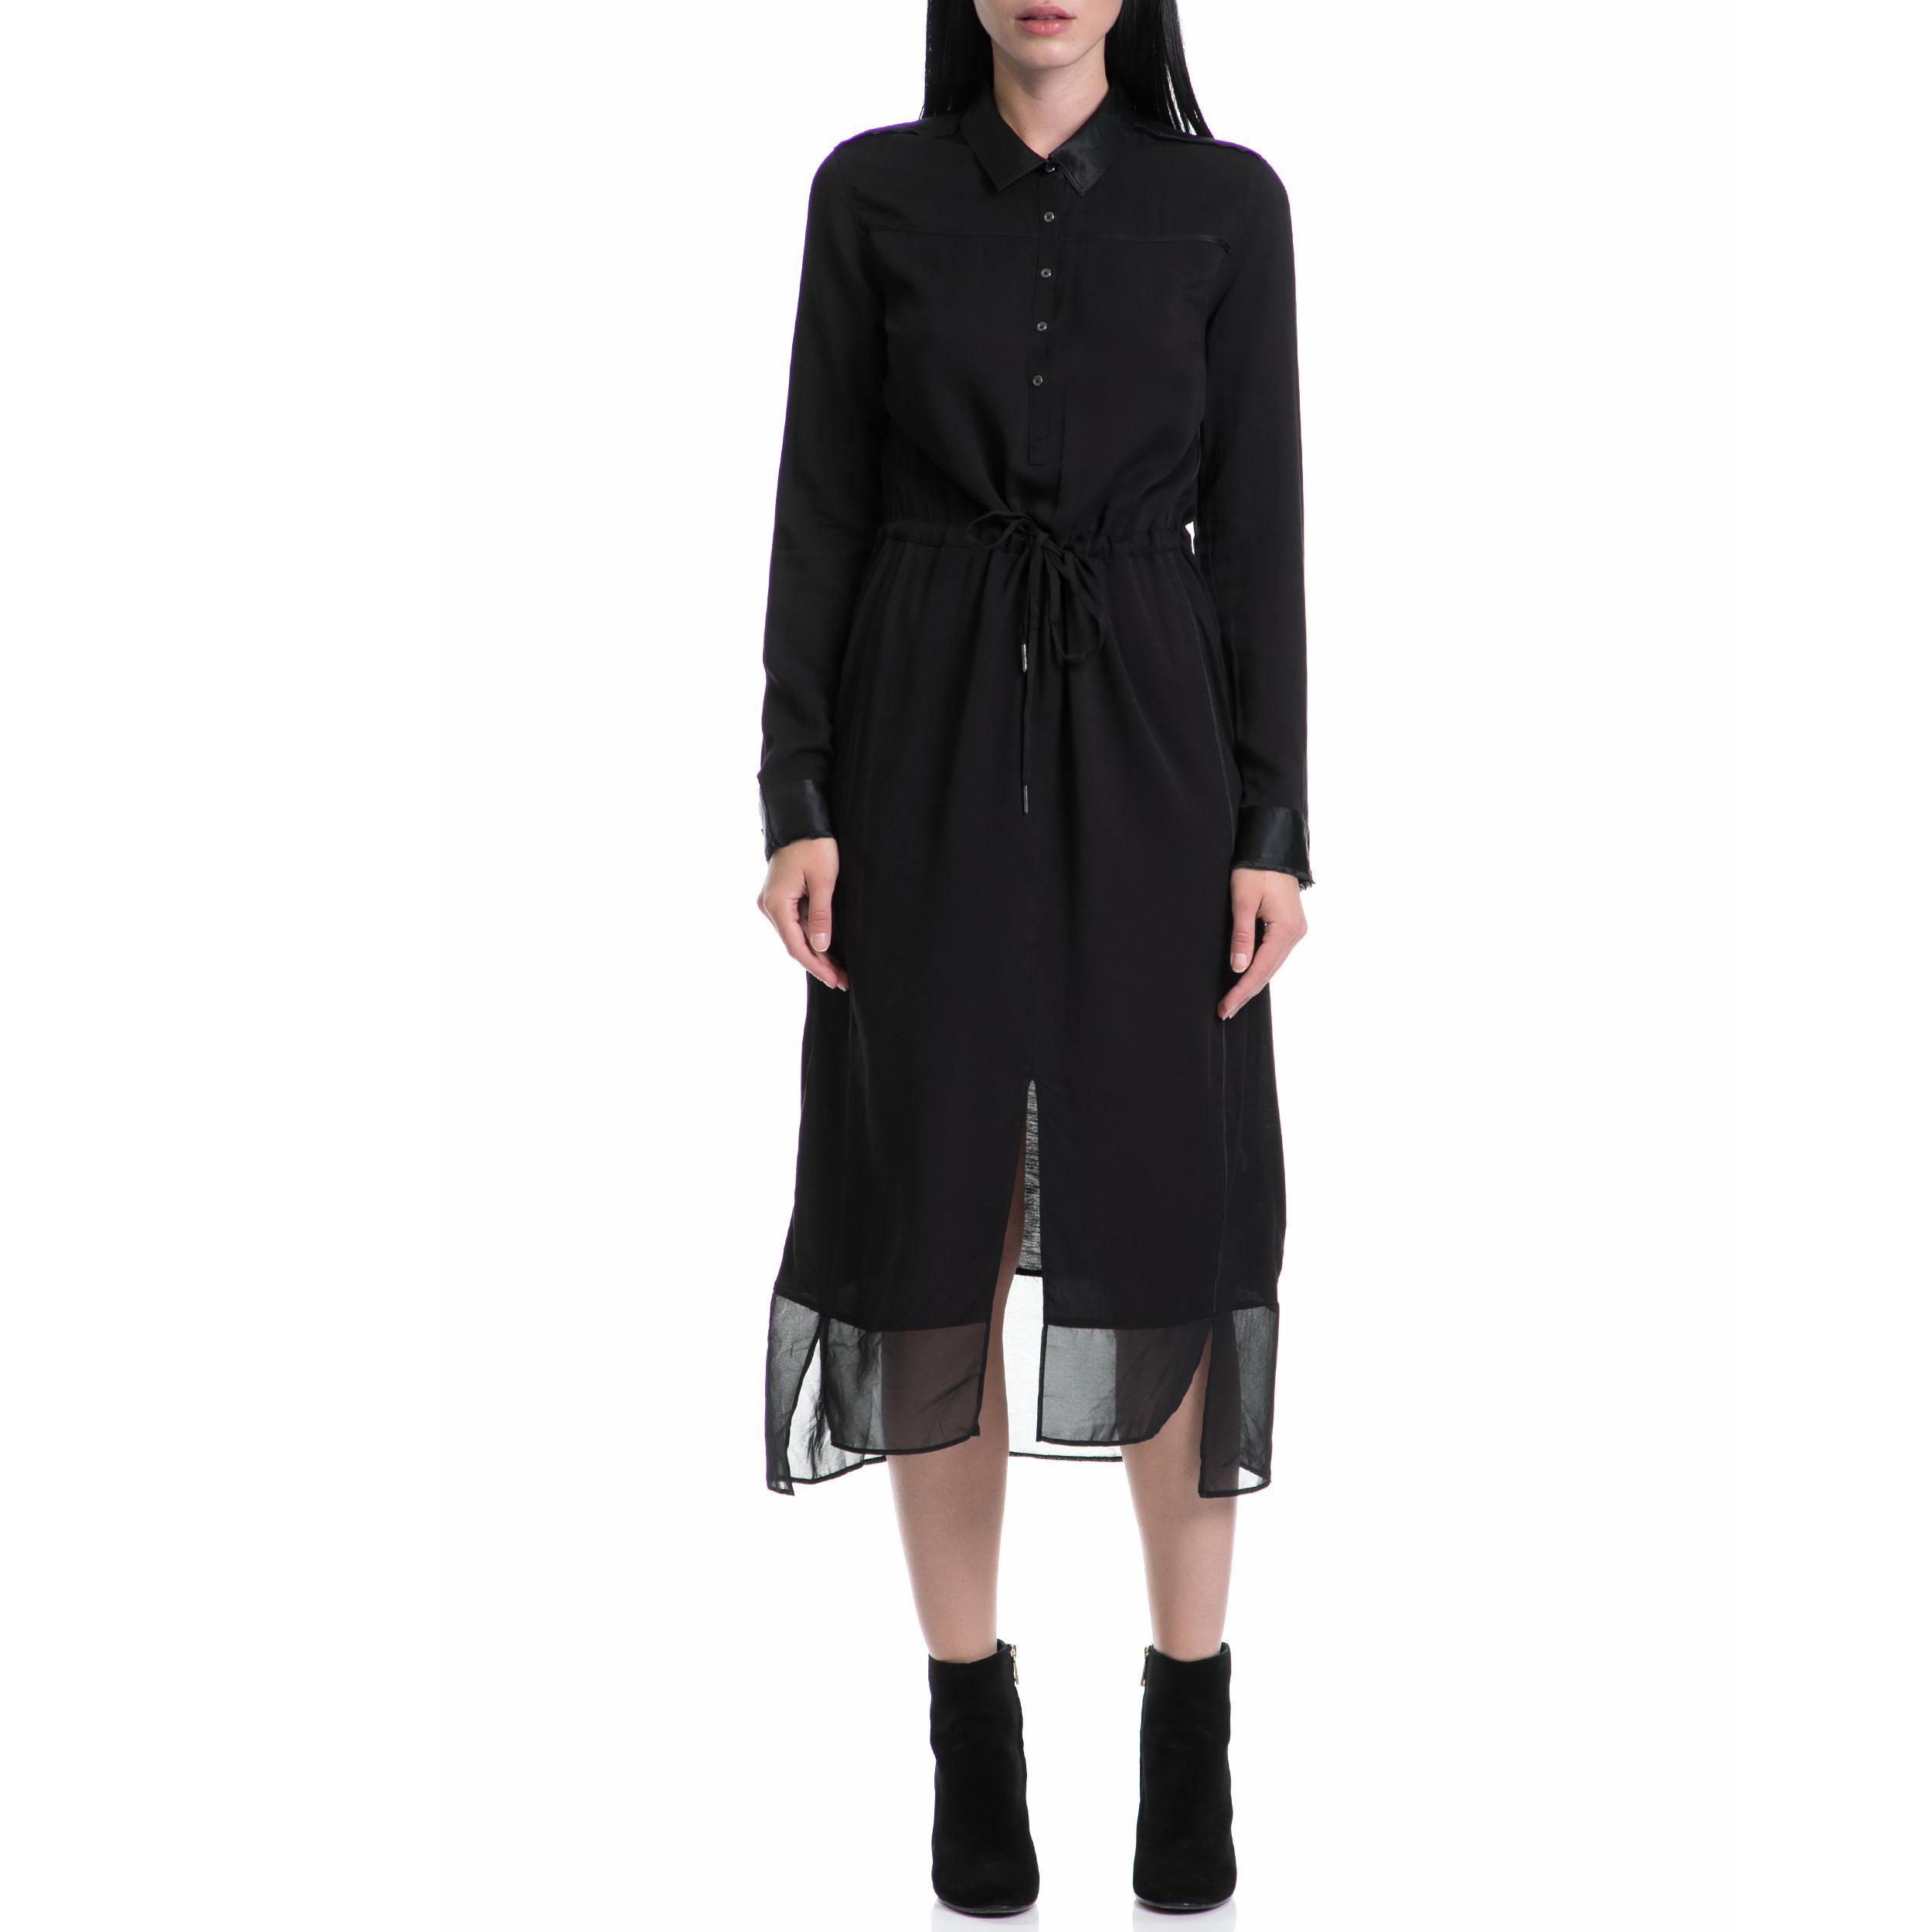 CALVIN KLEIN JEANS - Γυναικείο φόρεμα DULCIE SILK μαύρο γυναικεία ρούχα φορέματα μέχρι το γόνατο